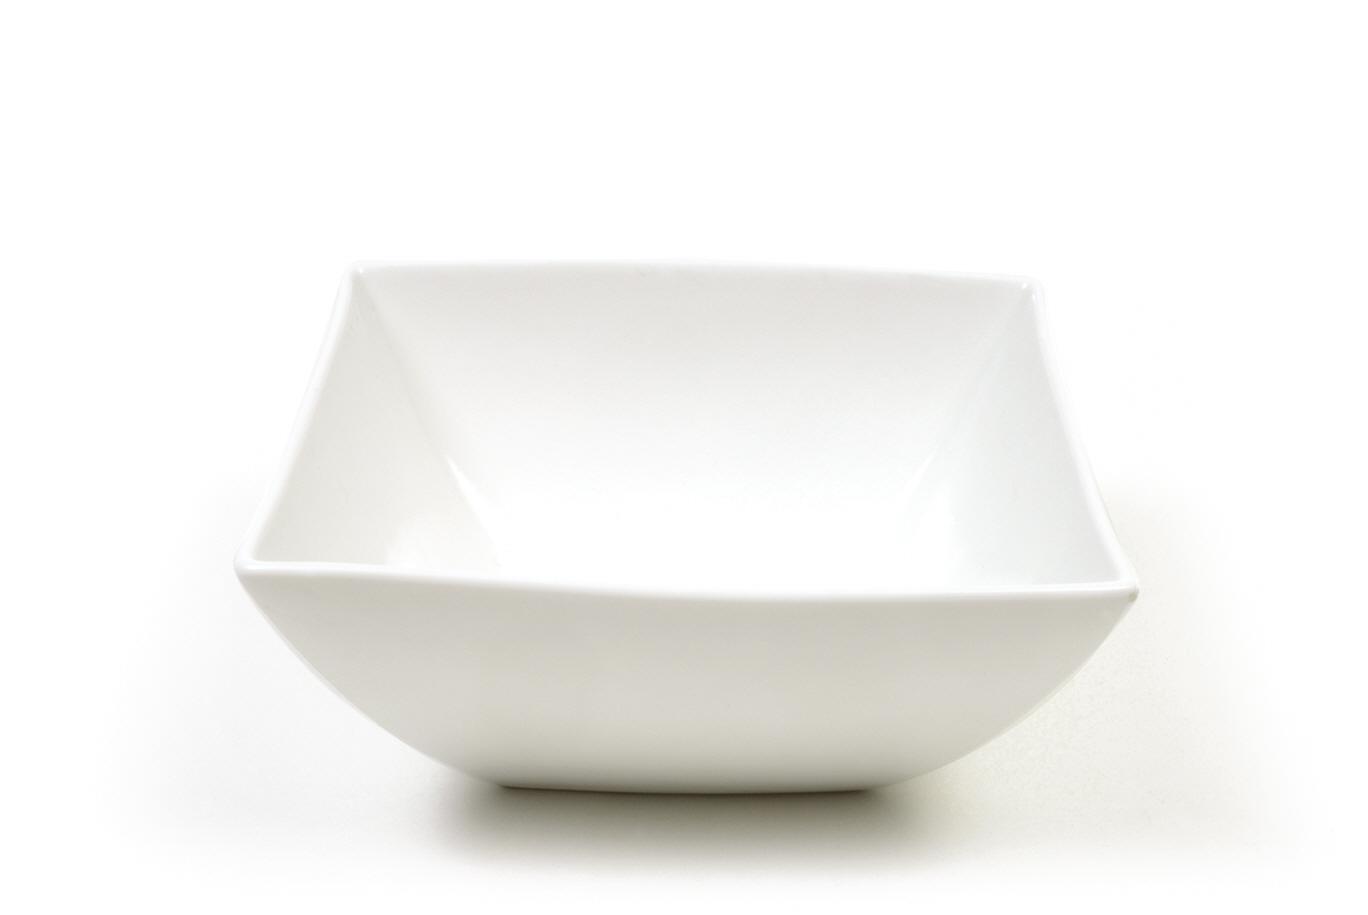 Čtvercová polévková miska East Meets West 18 x 18 cm - Maxwell&William